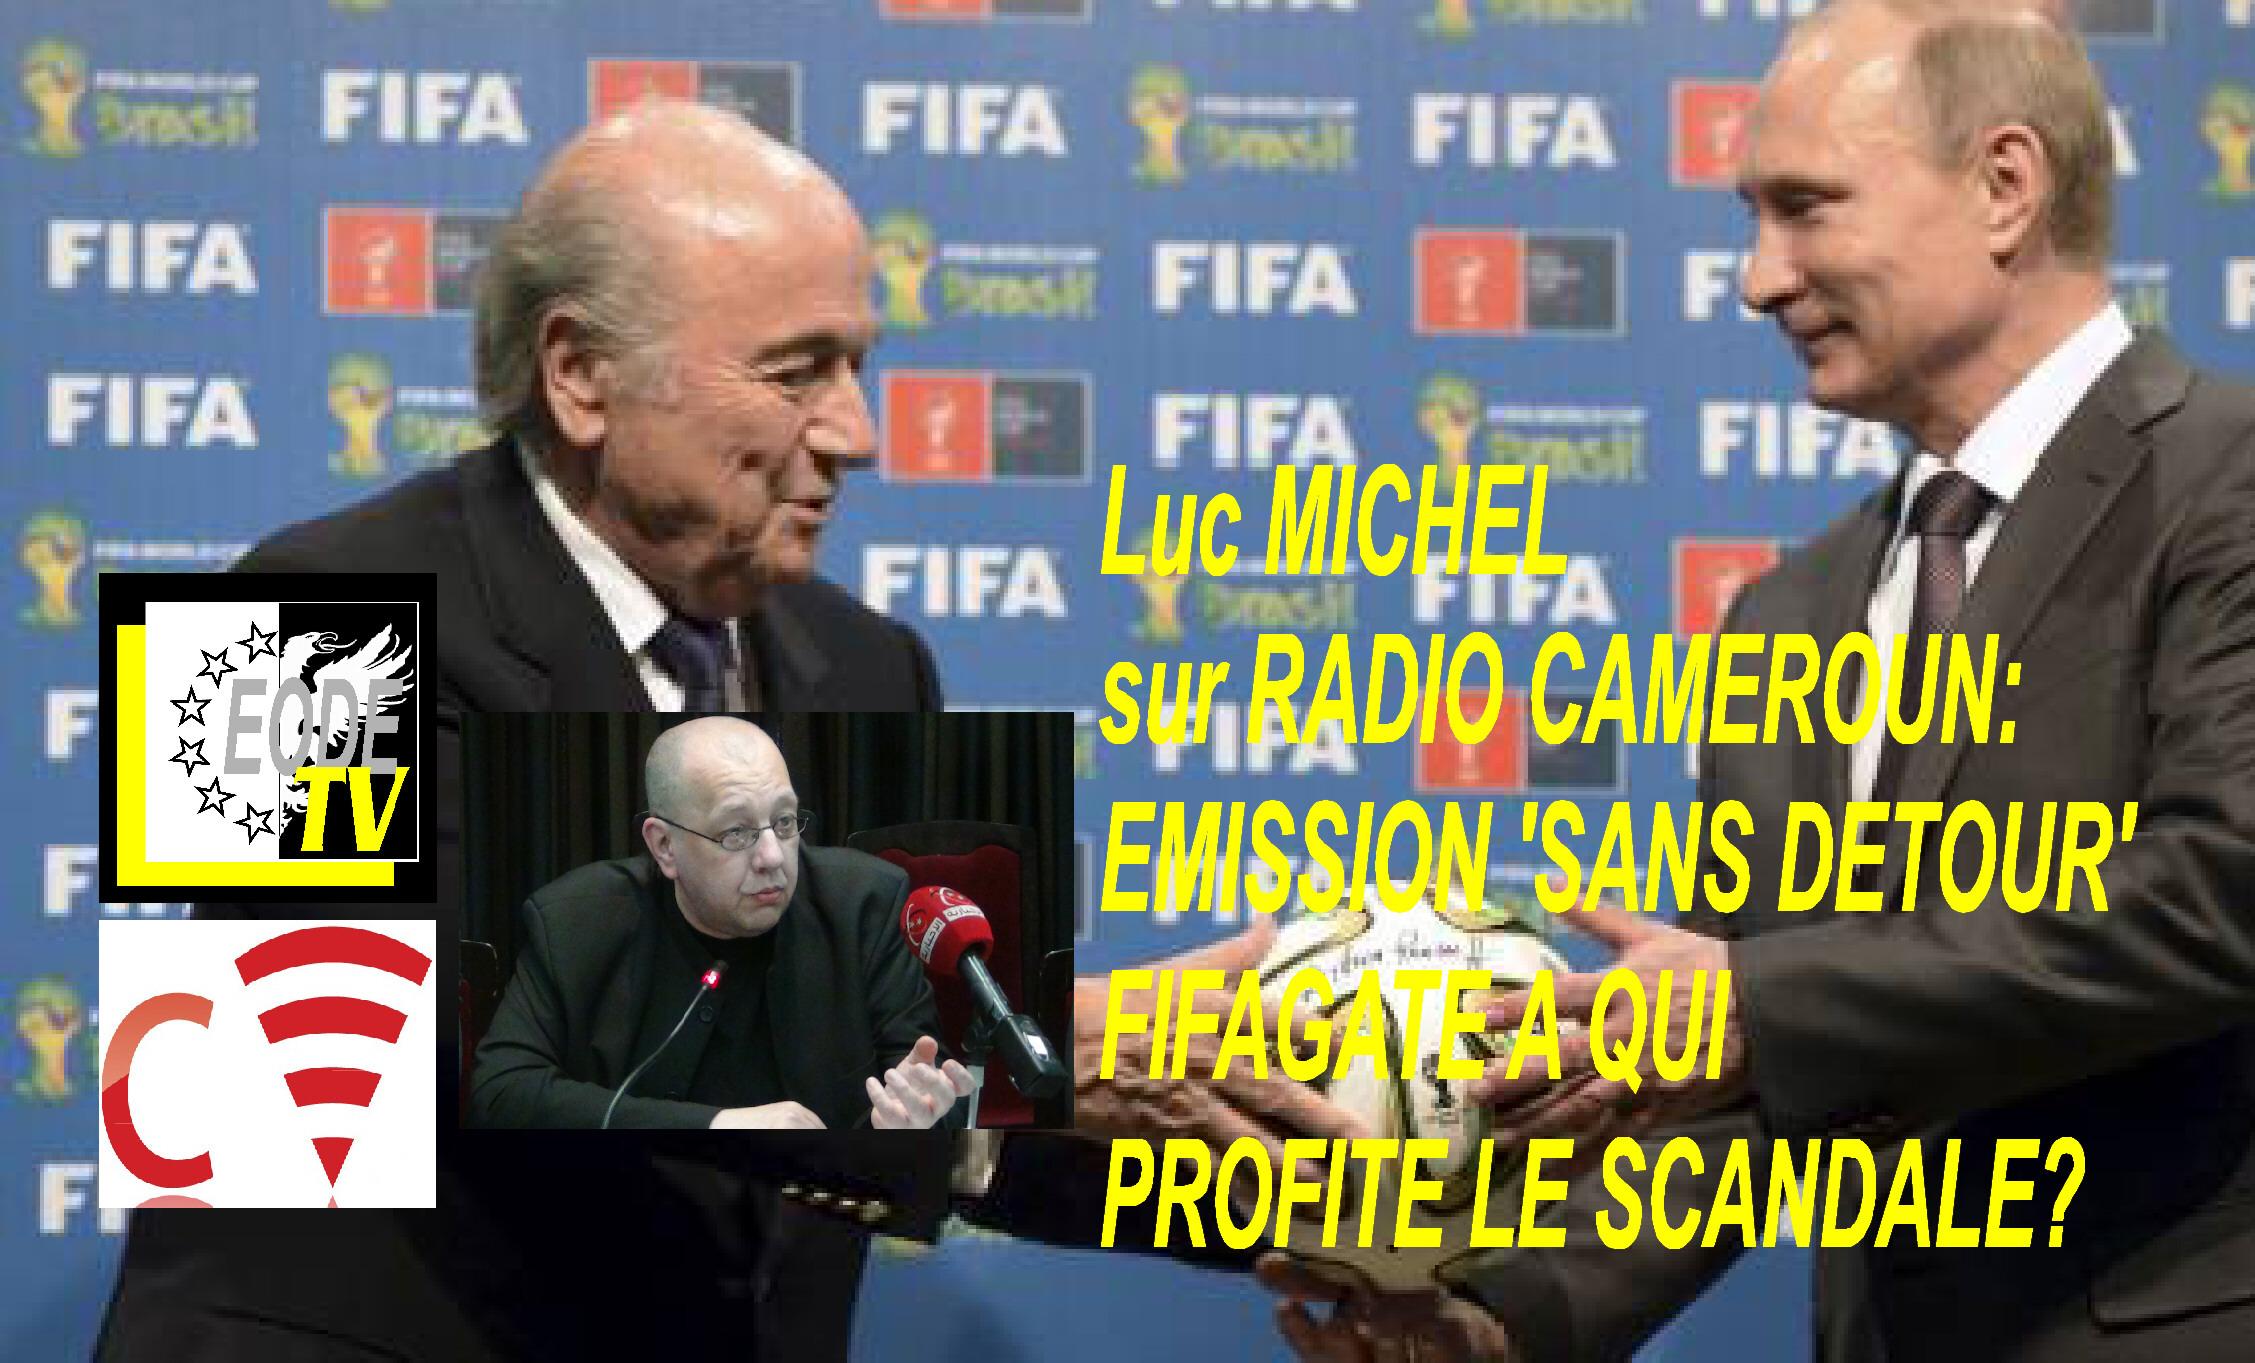 EODE-TV - RADIO CAM. lm fifagate (2015 06 07)  FR